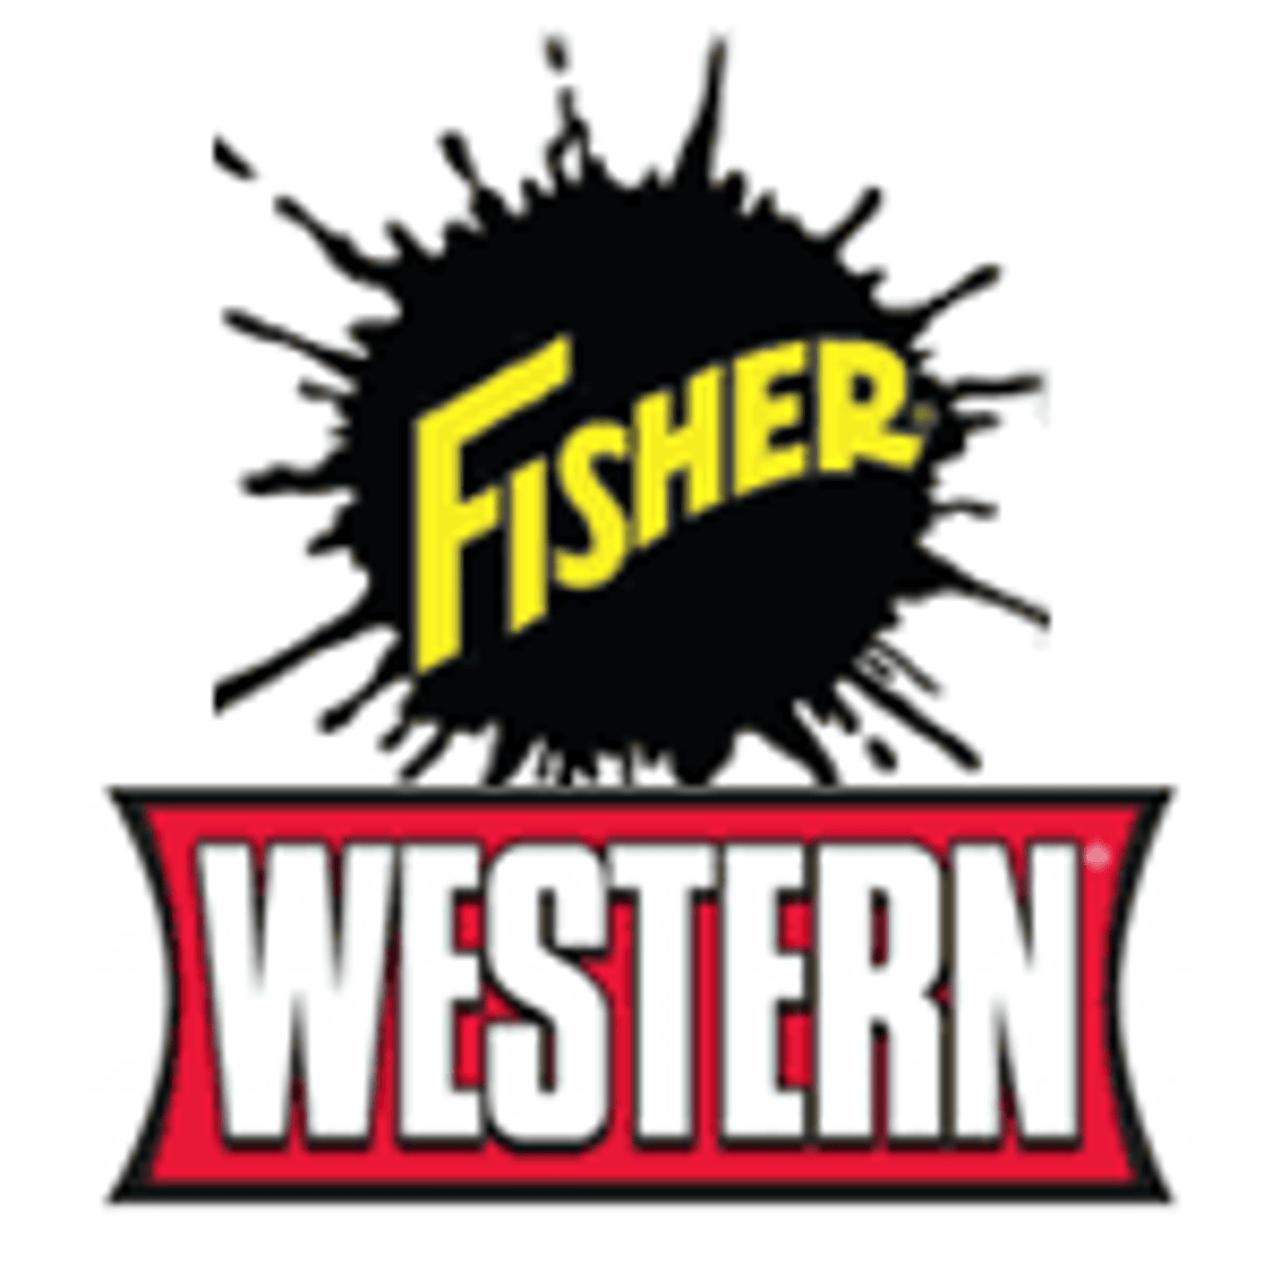 "72539 - FISHER STEELCASTER & POLYCASTER FLEET FLEX 8 PIN SPREADER 144"" EXTENSION HARNESS"